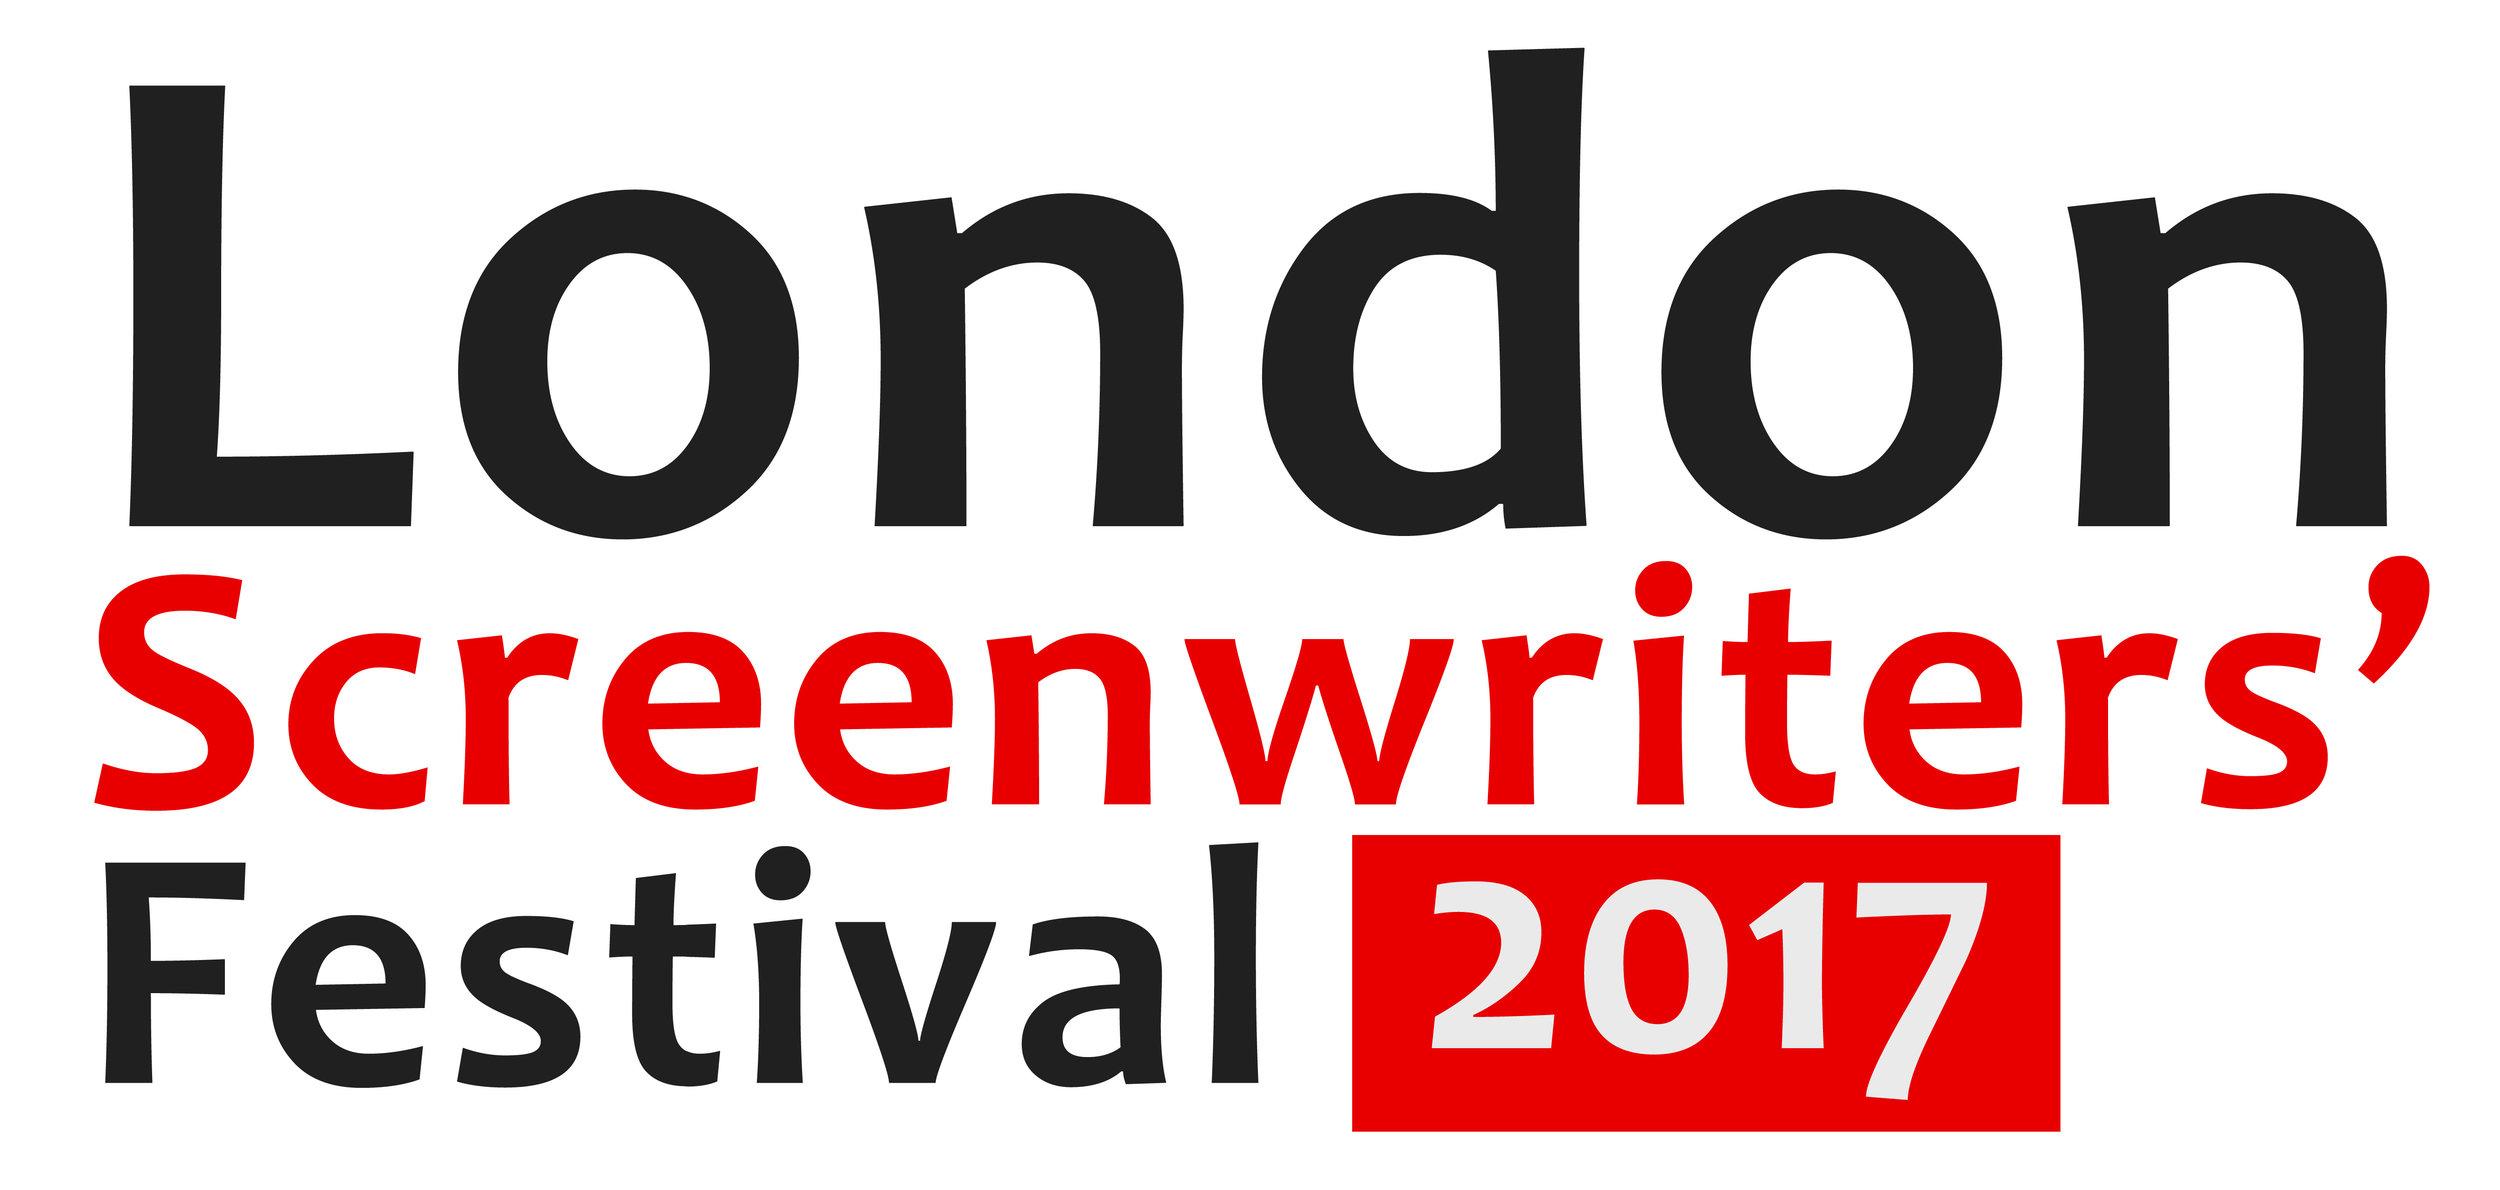 2017 LOGO screenwriters festival.jpg